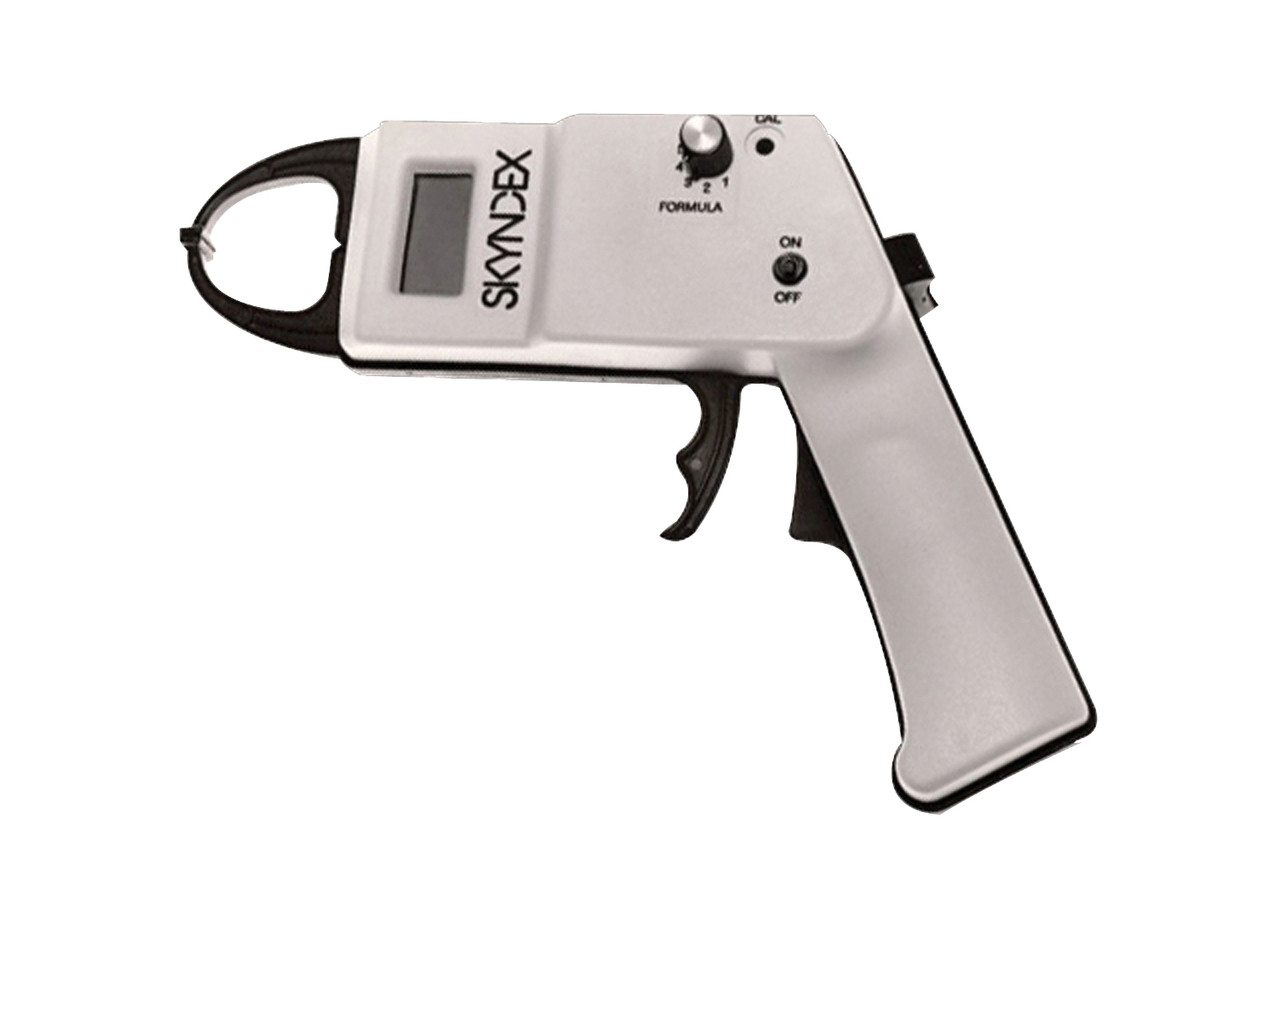 Skyndex¨ electronic skinfold caliper - Slaughter-Lohmann formula